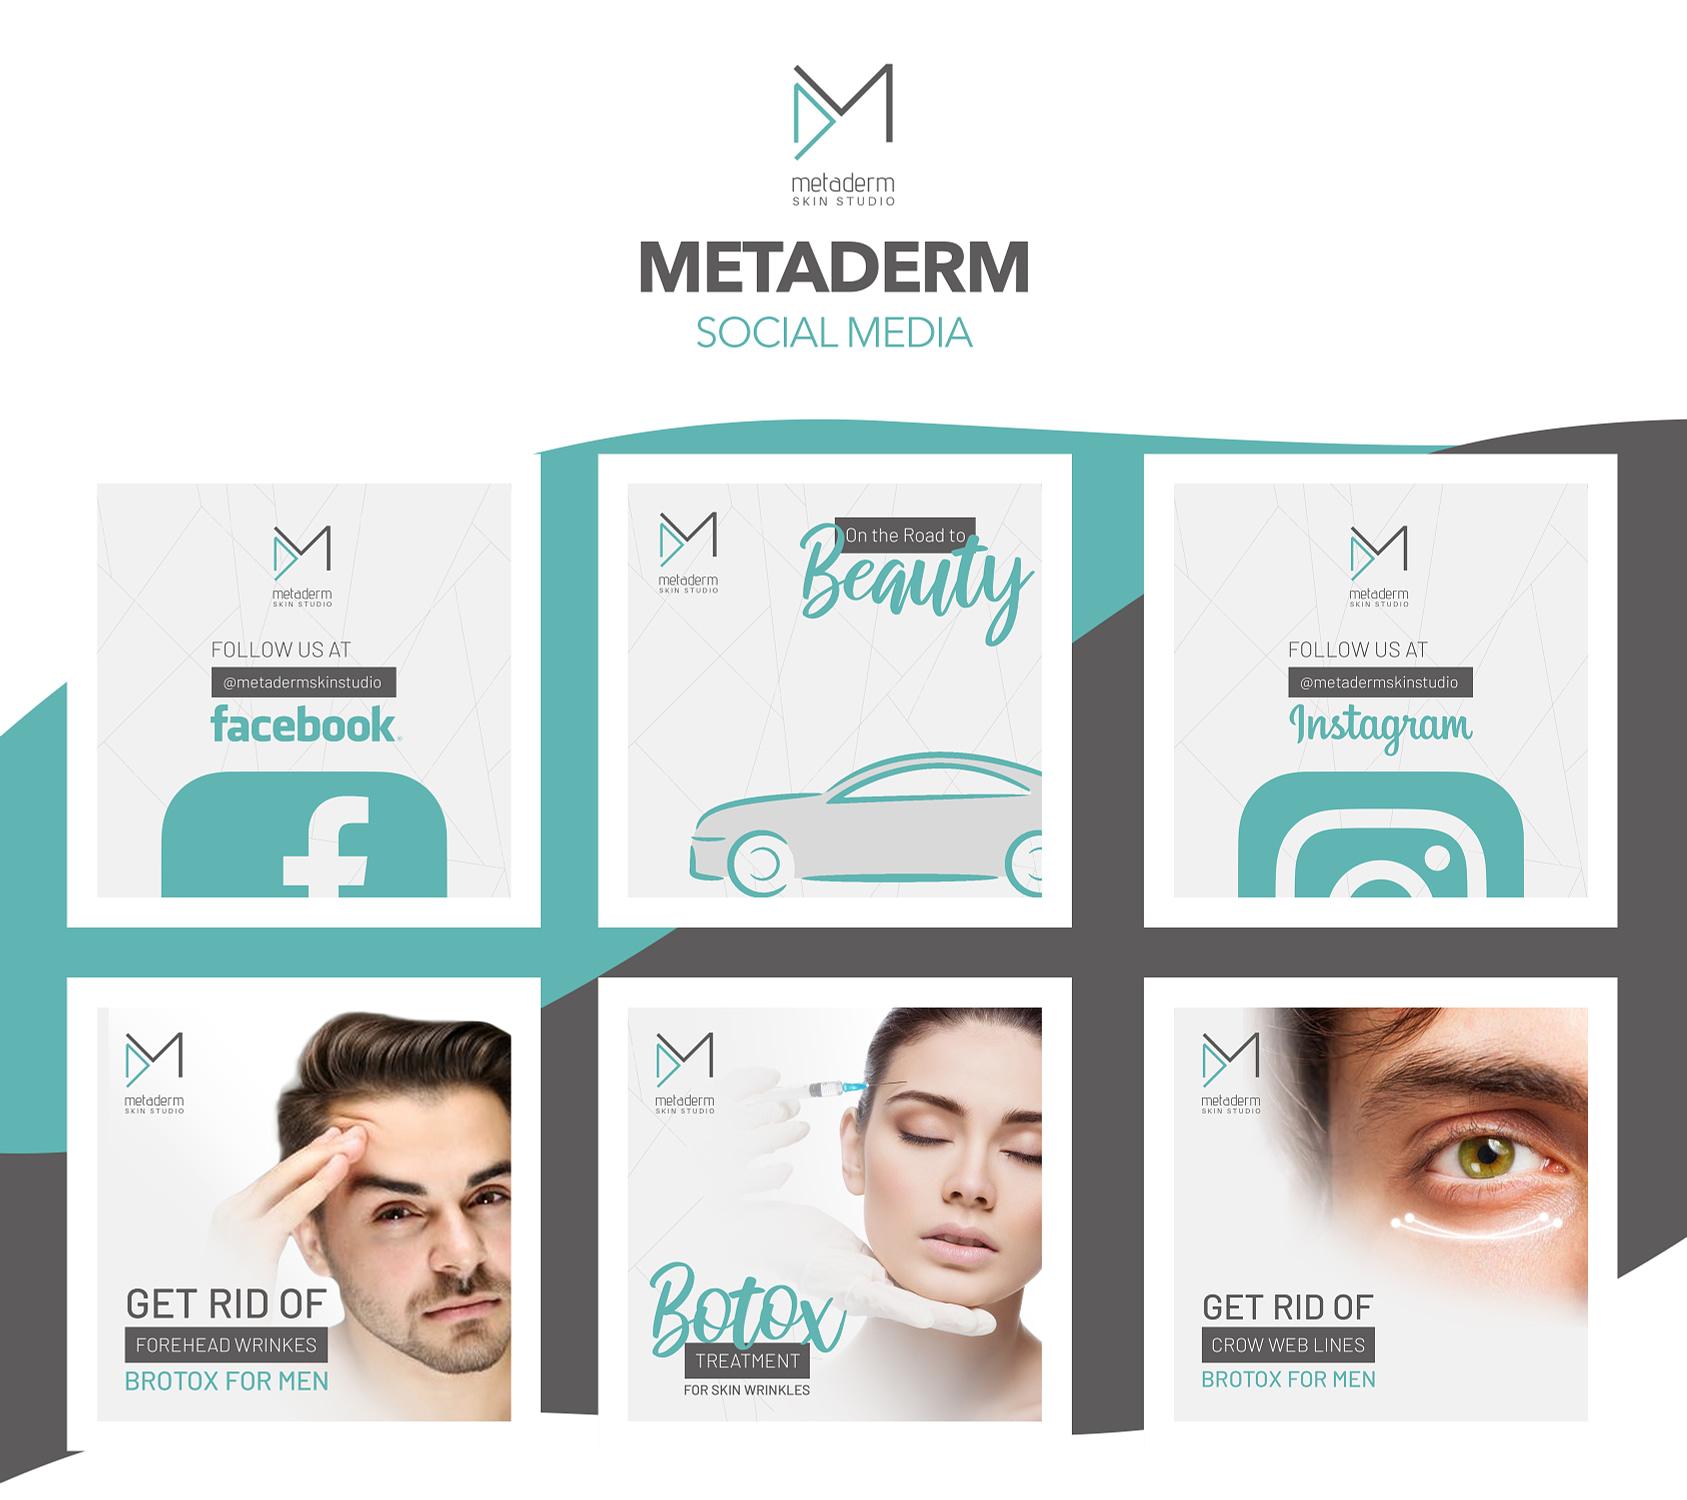 Metaderm SMM